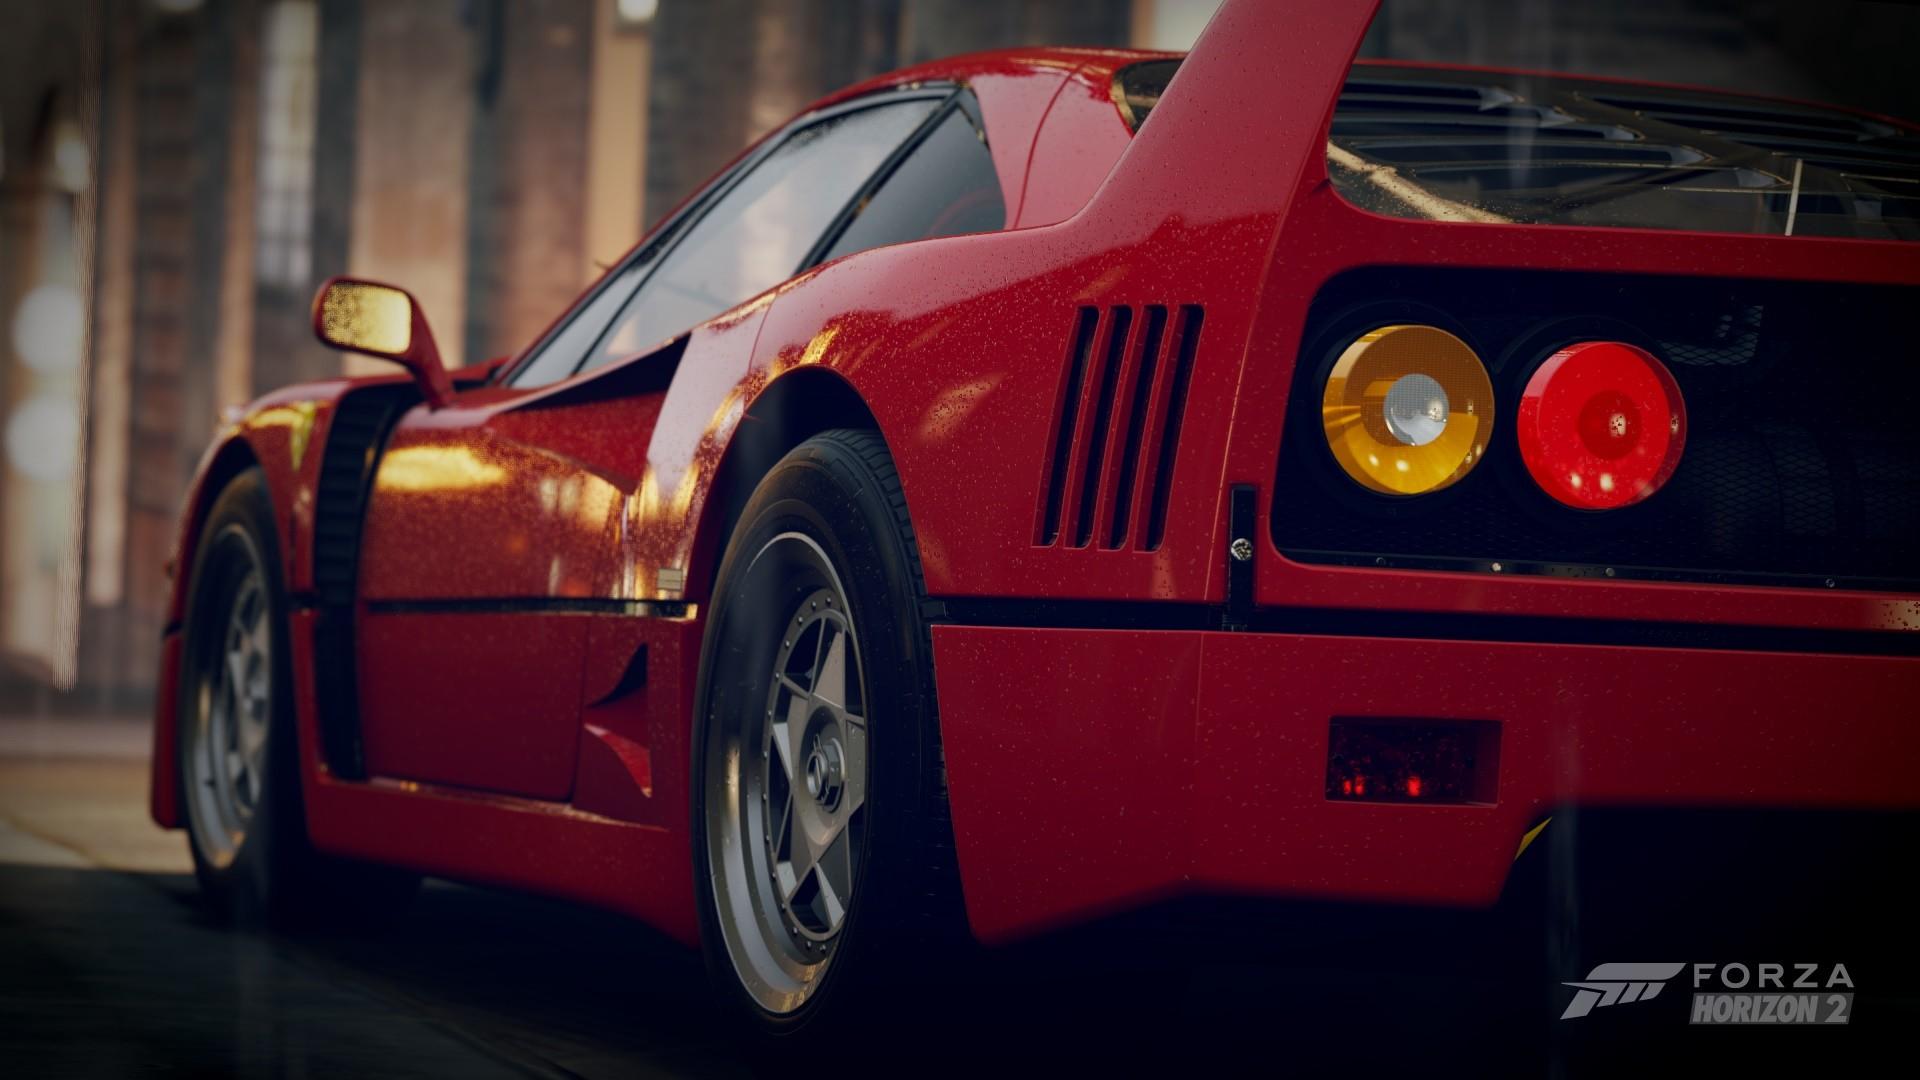 Wallpaper  1920x1080 px, car, Ferrari F40, Forza Horizon 2